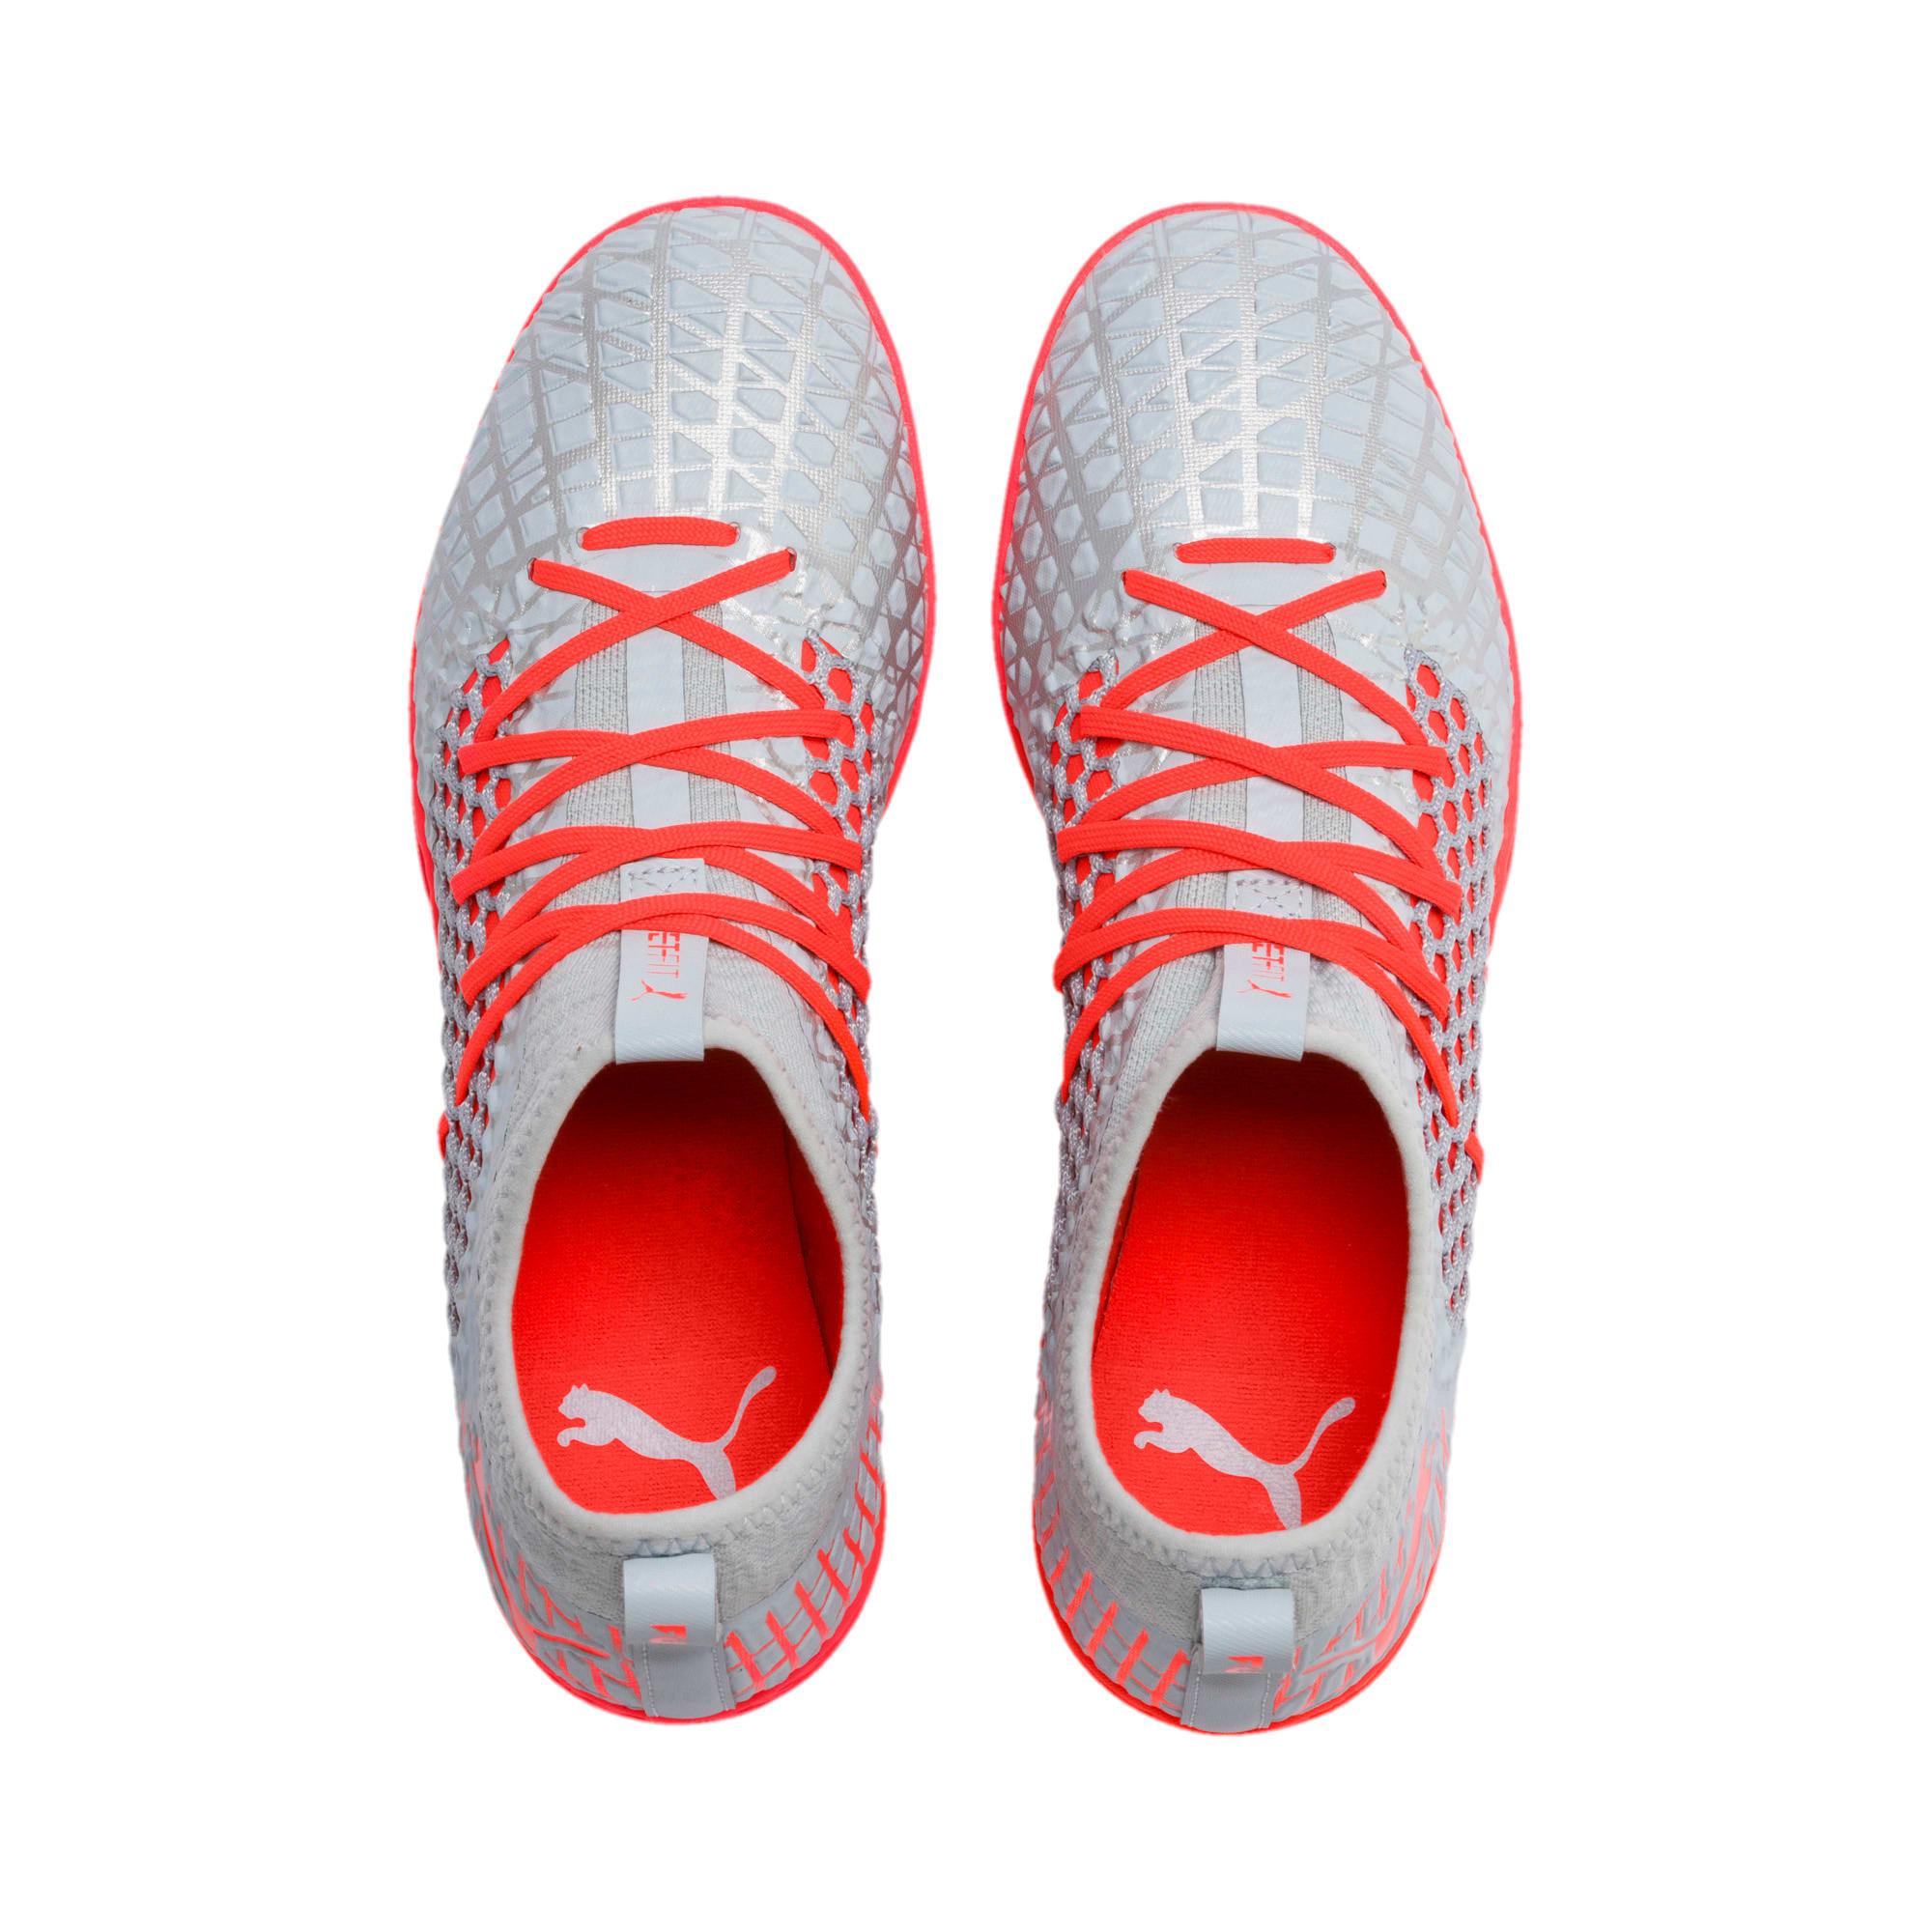 Thumbnail 7 of FUTURE 4.3 NETFIT TT Men's Soccer Shoes, Glacial Blue-Nrgy Red, medium